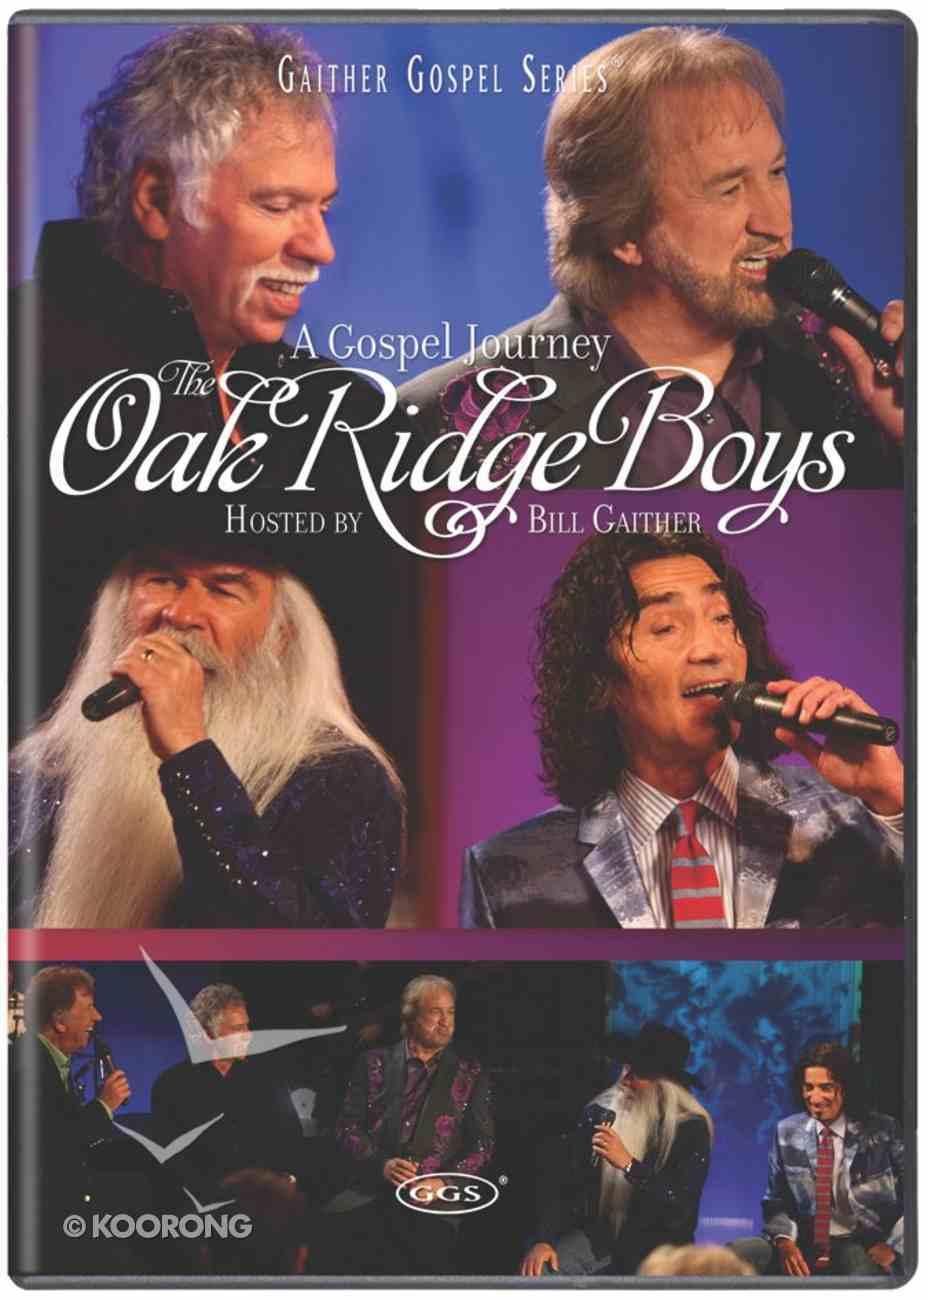 Gospel Journey, a - the Oak Ridge Boys (Gaither Gospel Series) DVD